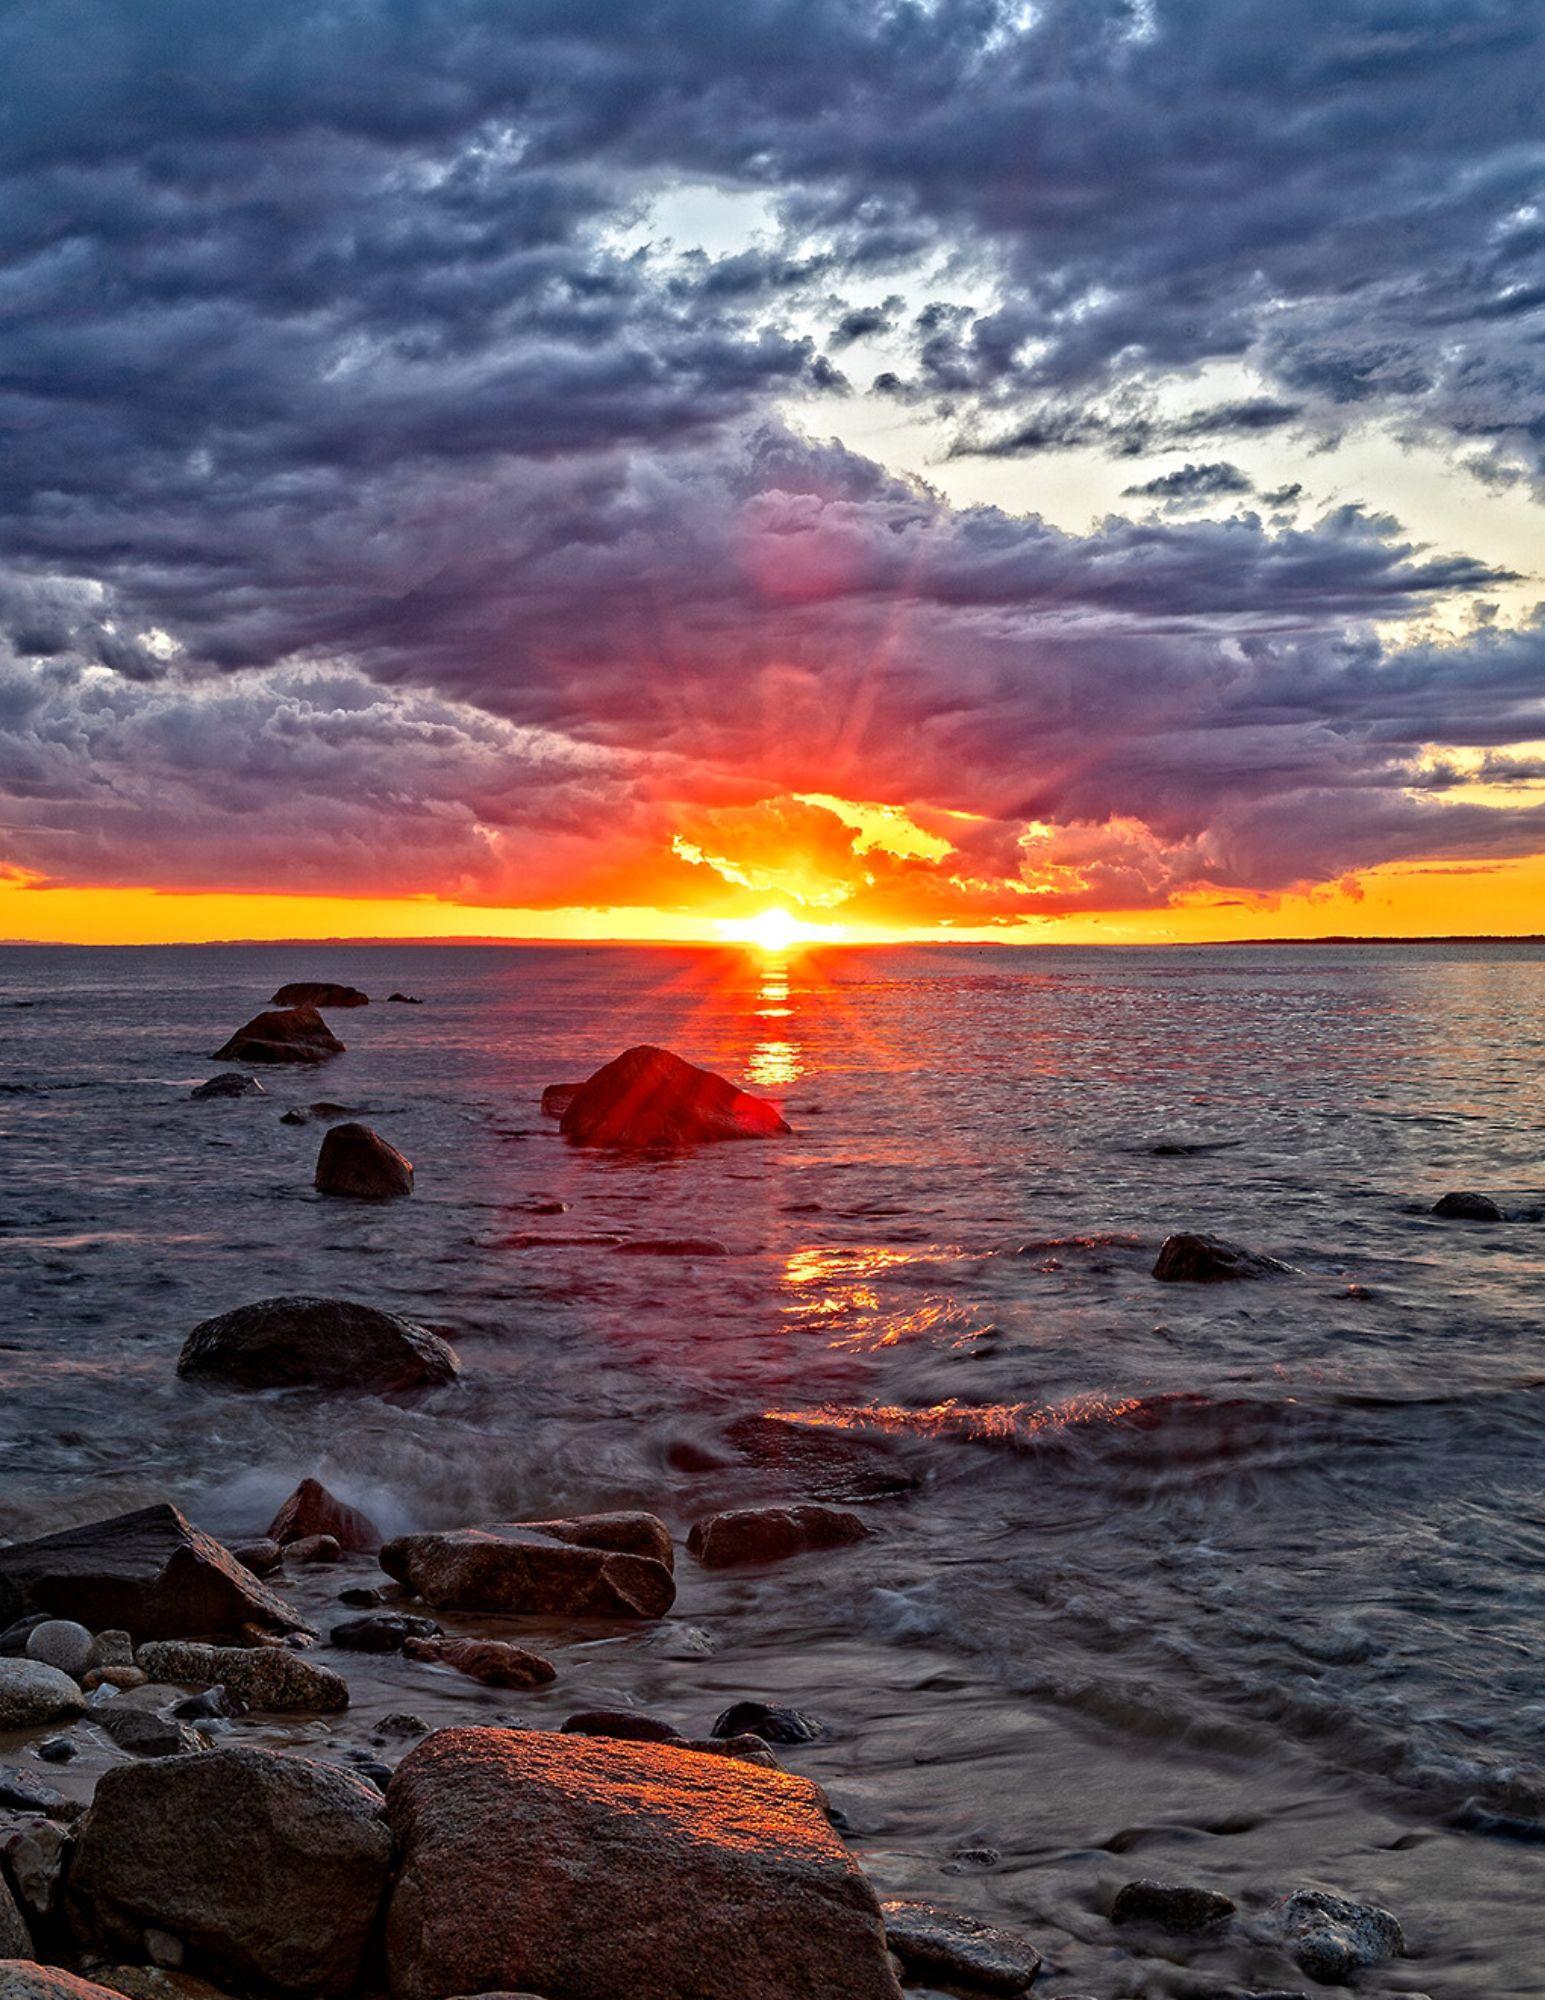 John Montes Jr Photography Best Places to Photograph Sunrise and Sunset on Marthas Vineyard-Best Places to Photograph Sunrise and Sunset on Marthas Vineyard-26